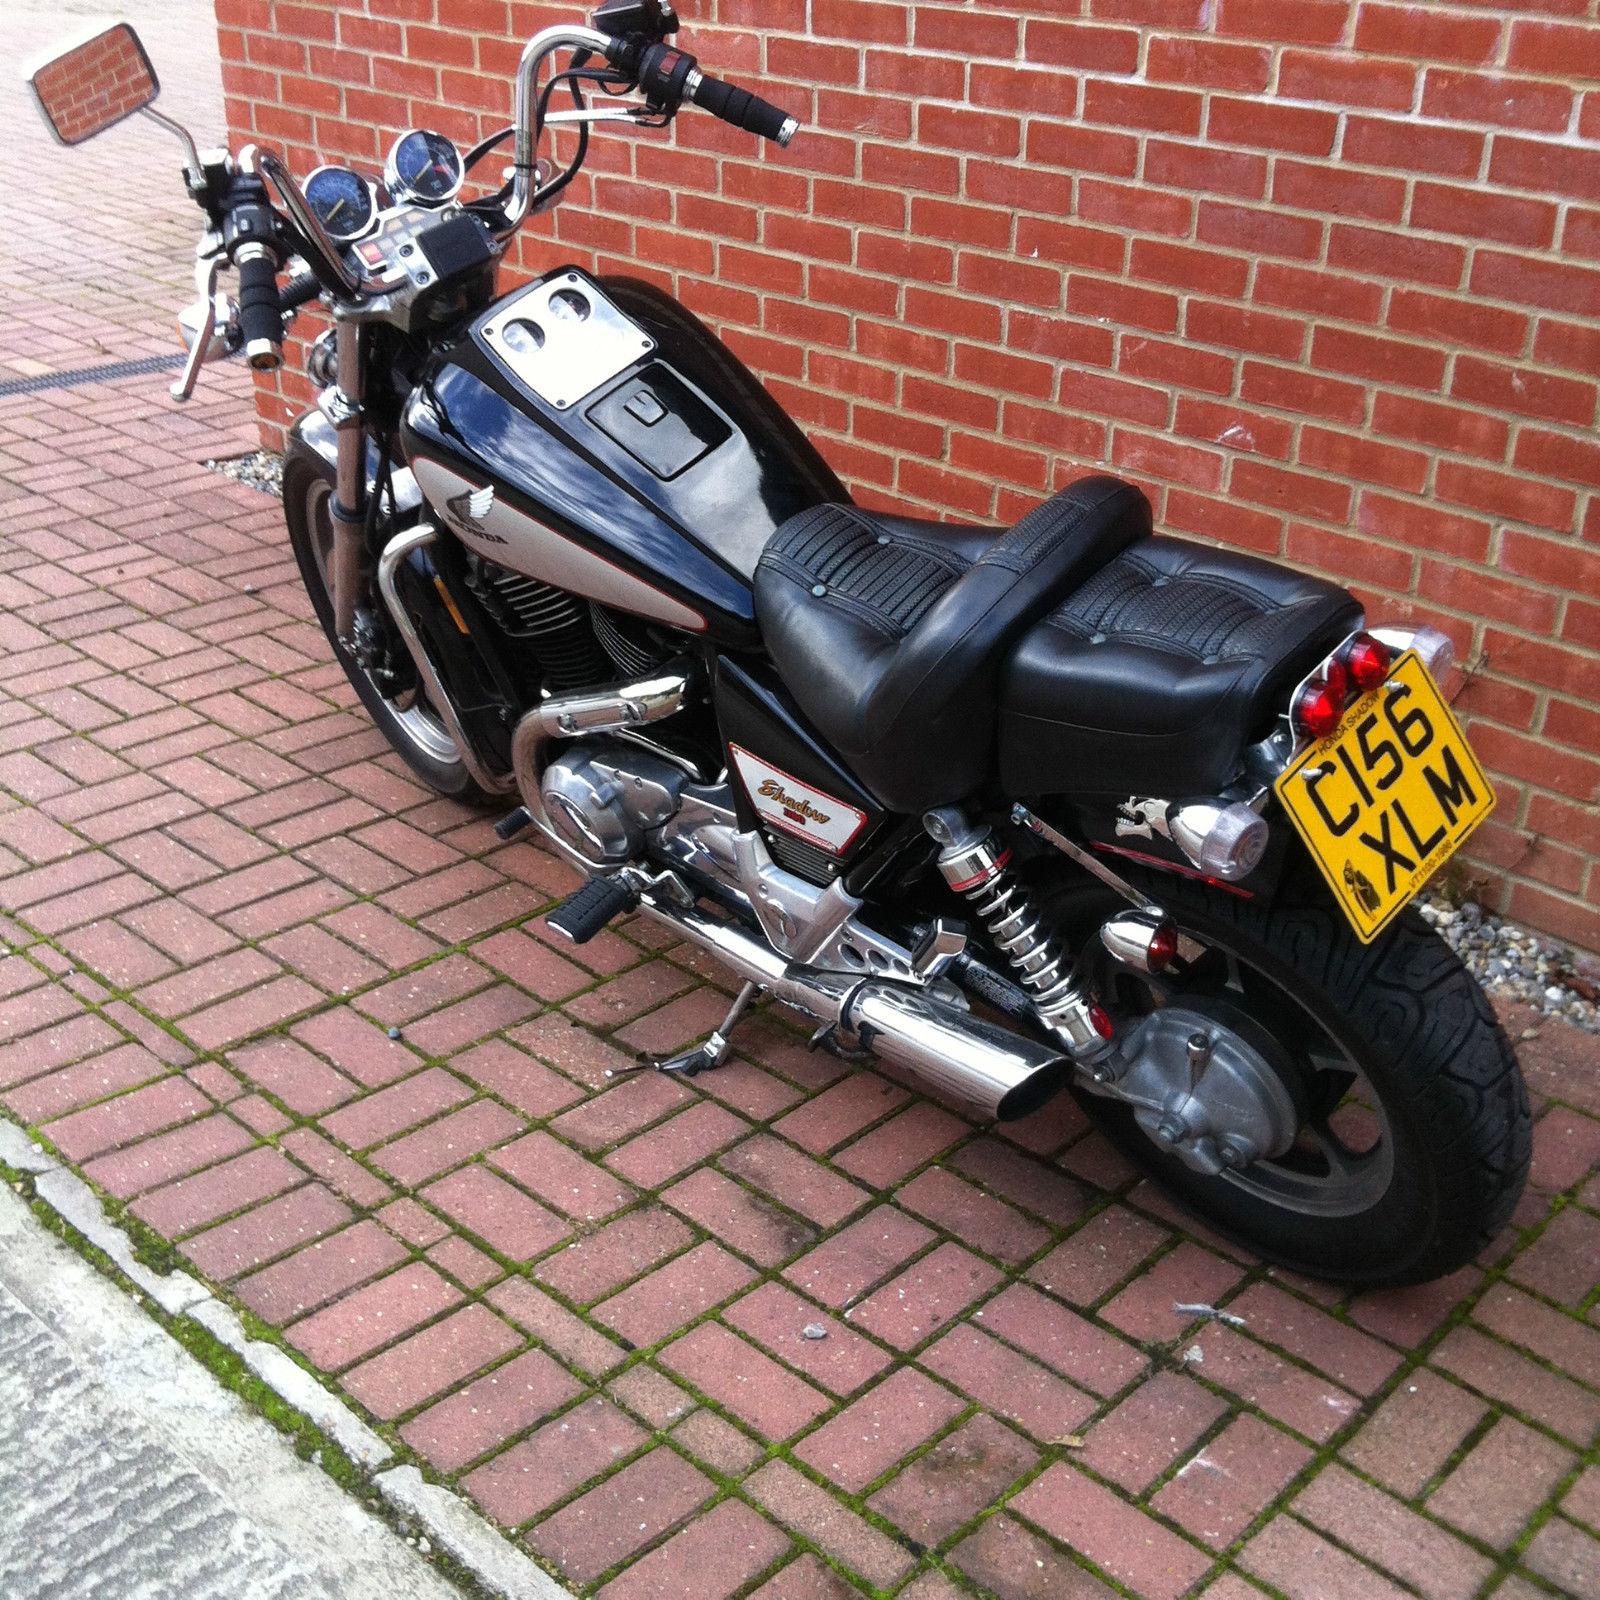 Honda Shadow Spirit 1100 - Motorcycle Specification